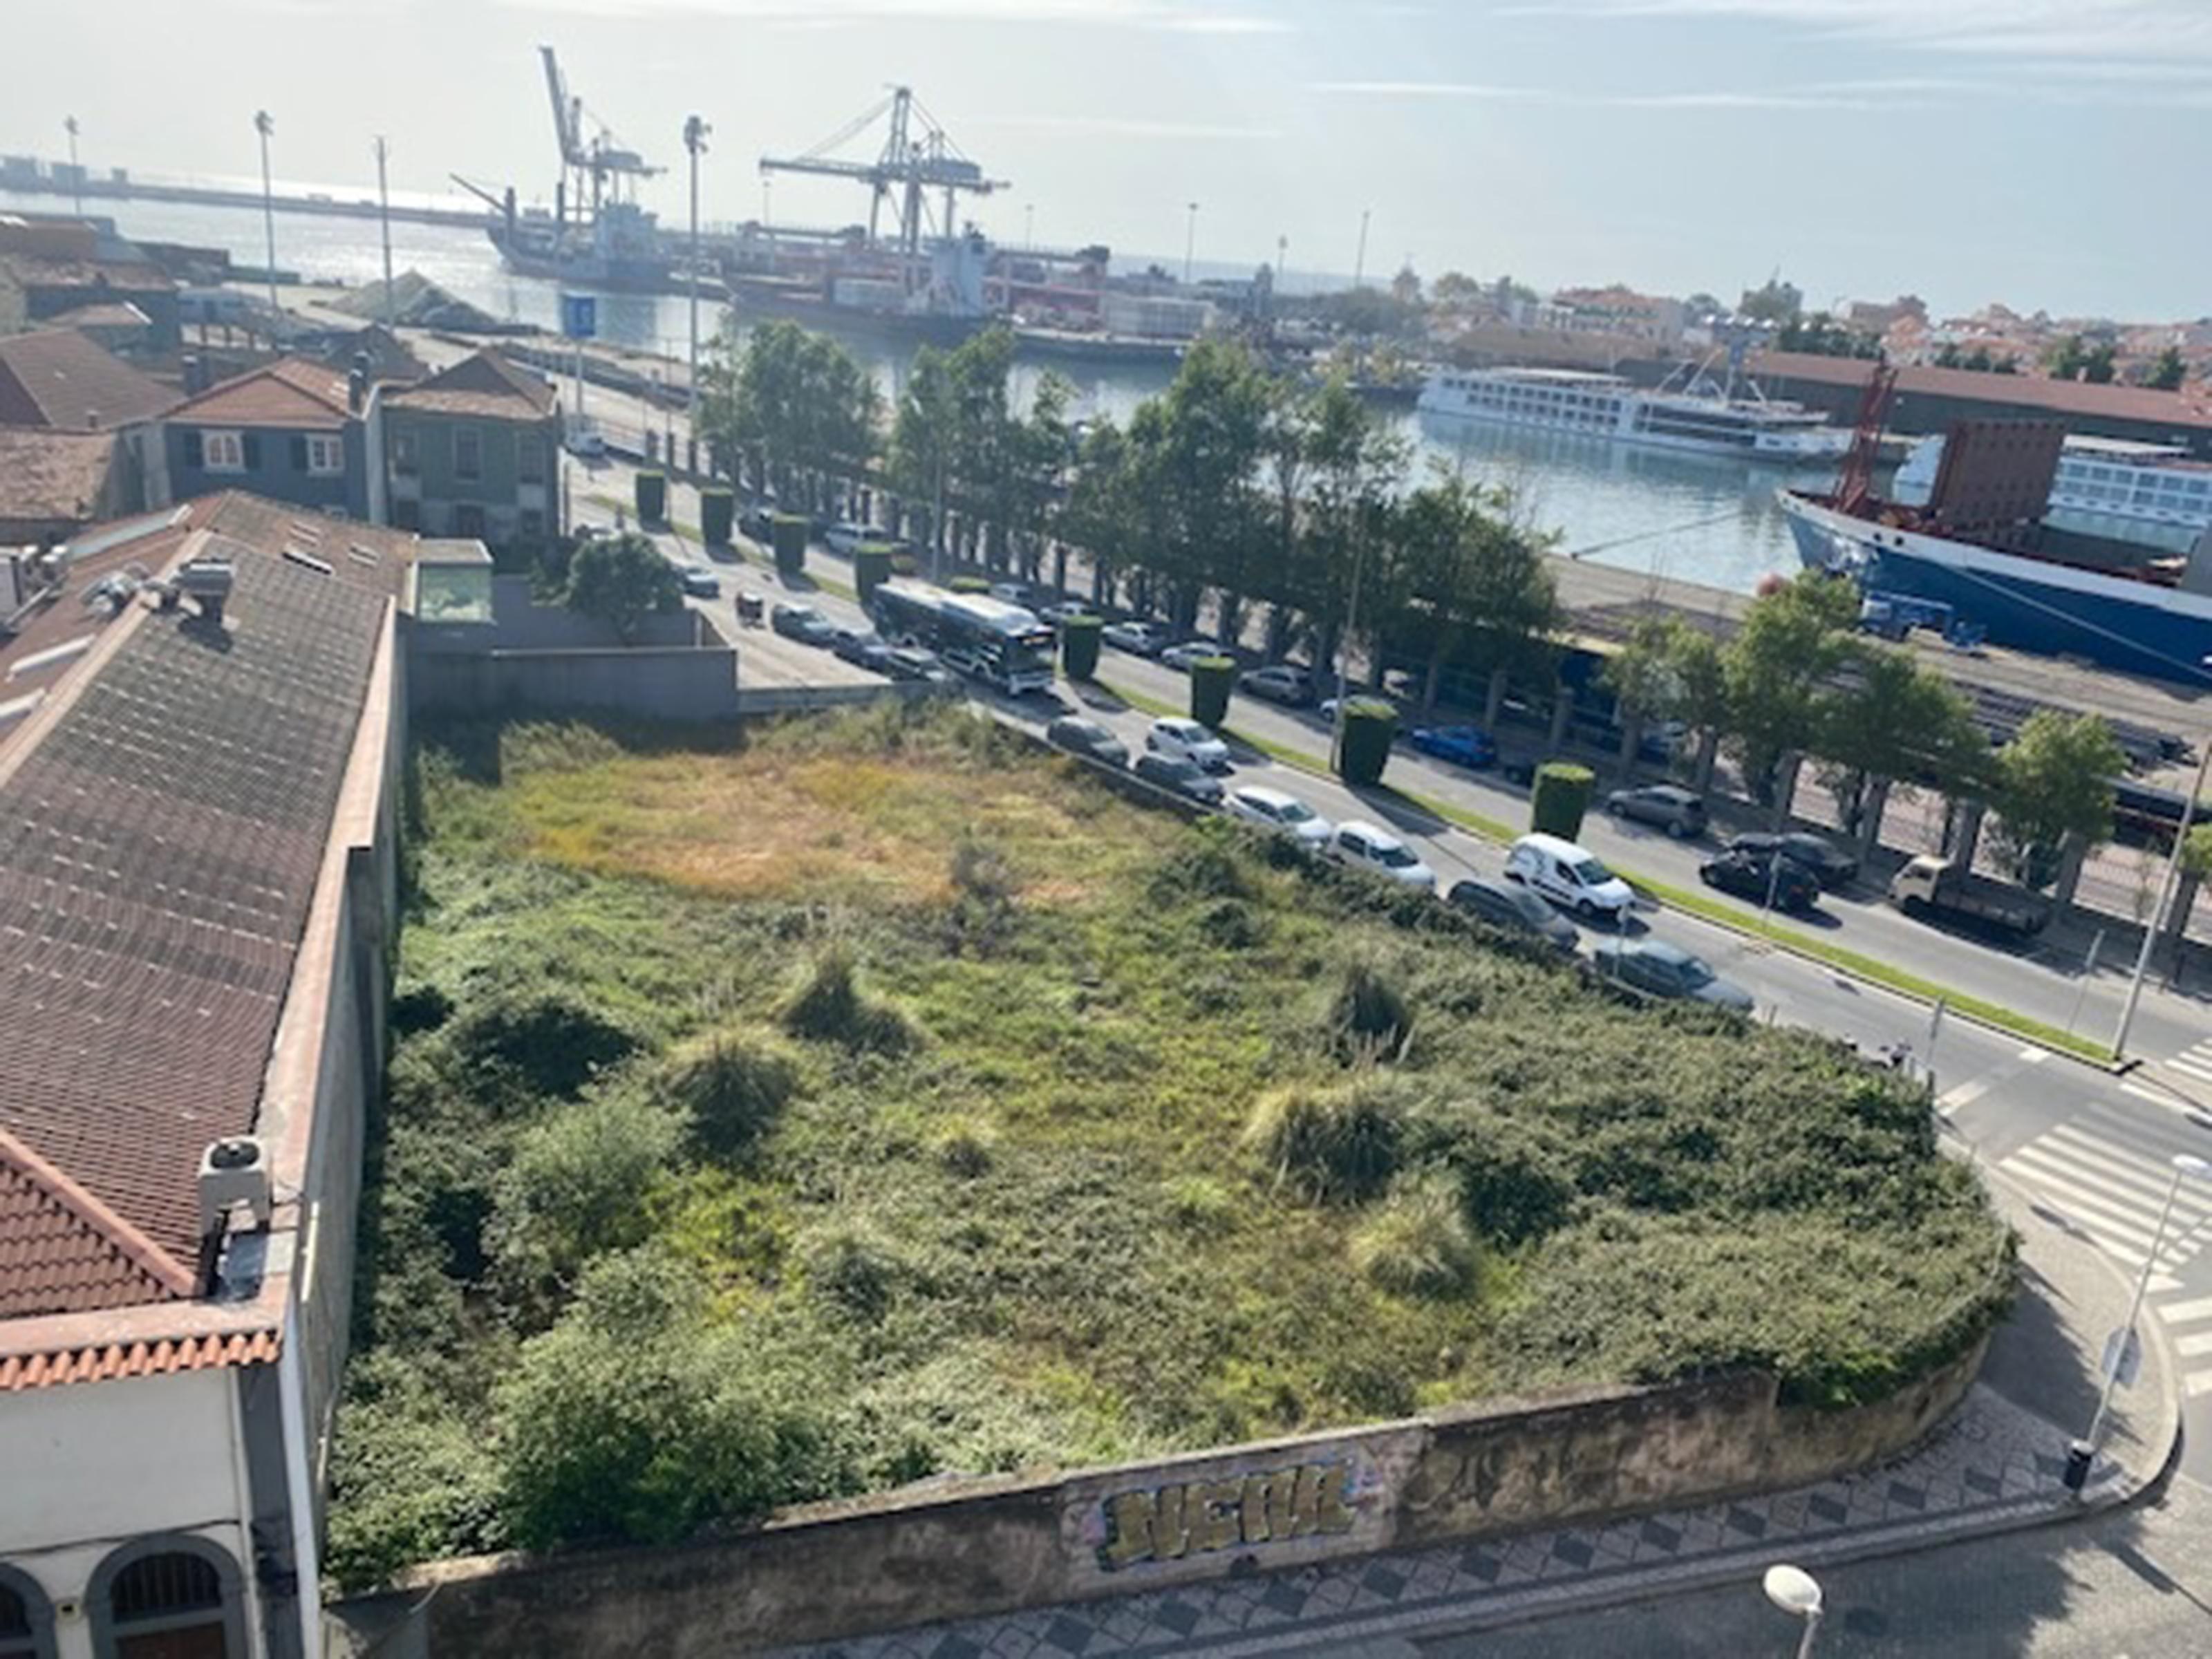 Inproject Land in Matosinhos-Sul (Matosinhos) – 4088.9 m²